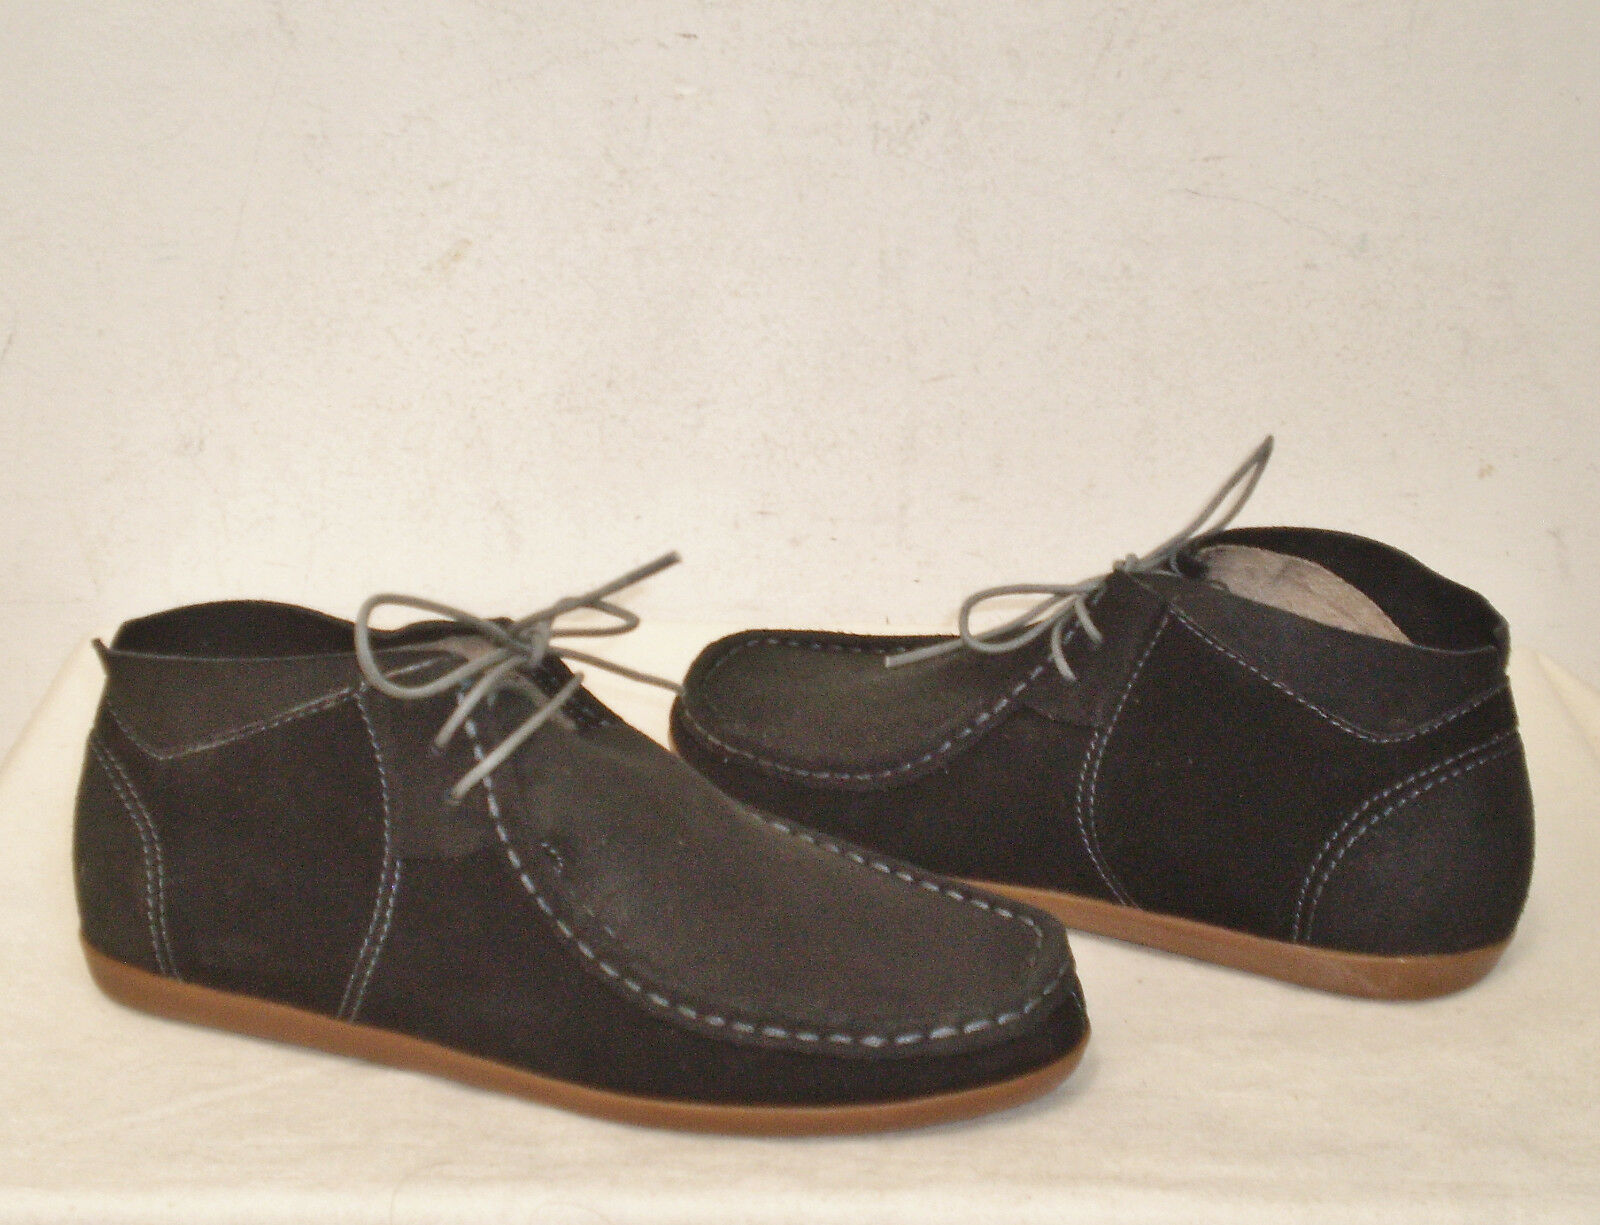 conveniente OLUKAI donna POKO Ankle scarpe 7US nero nero  NWOB NWOB NWOB  120 MSRP  in vendita scontato del 70%